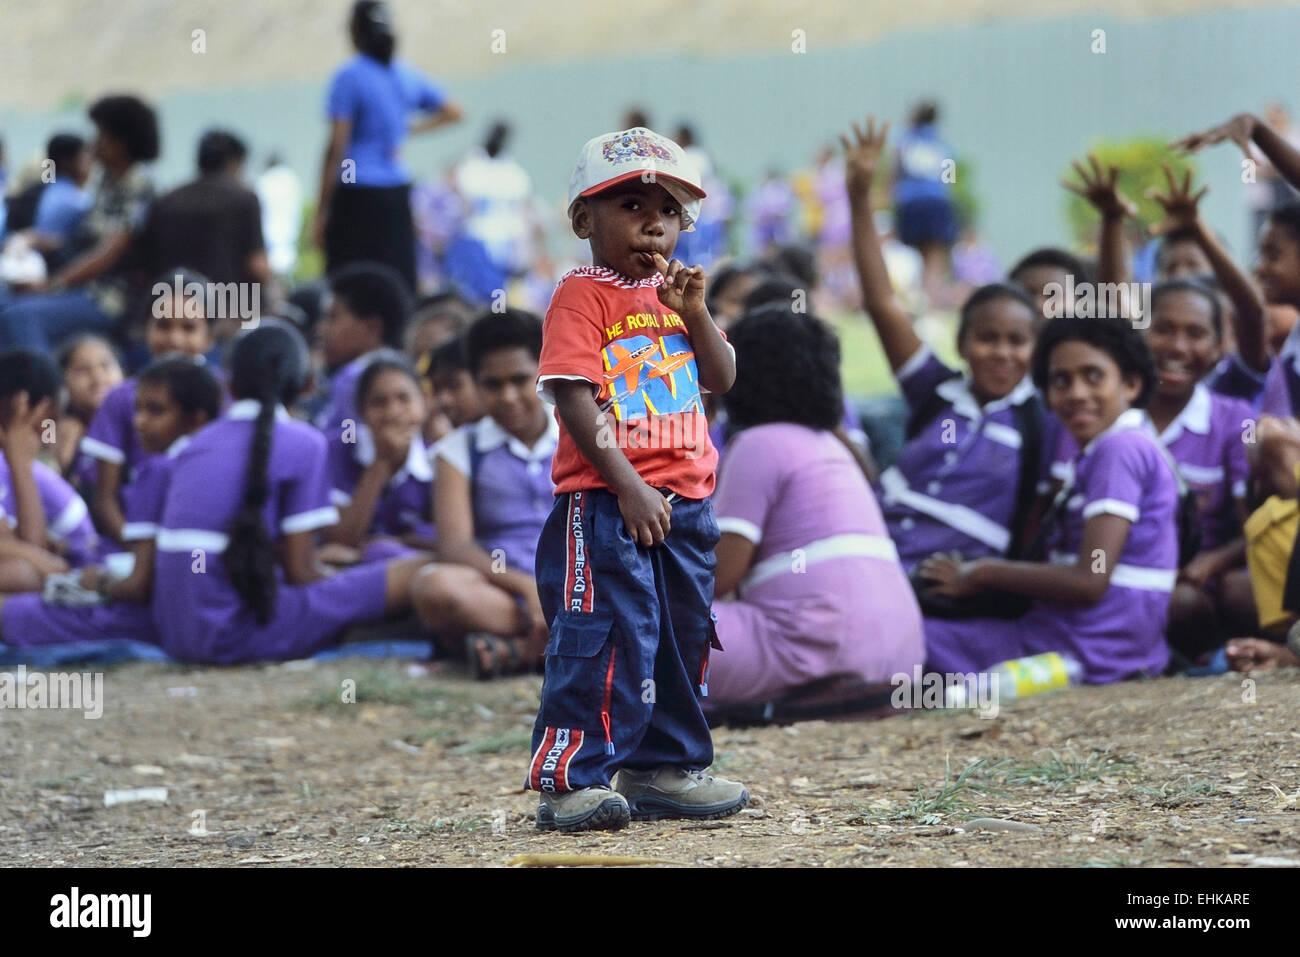 Schoolchildren at Churchill Park. Lautoka. Fiji. Pacific. - Stock Image